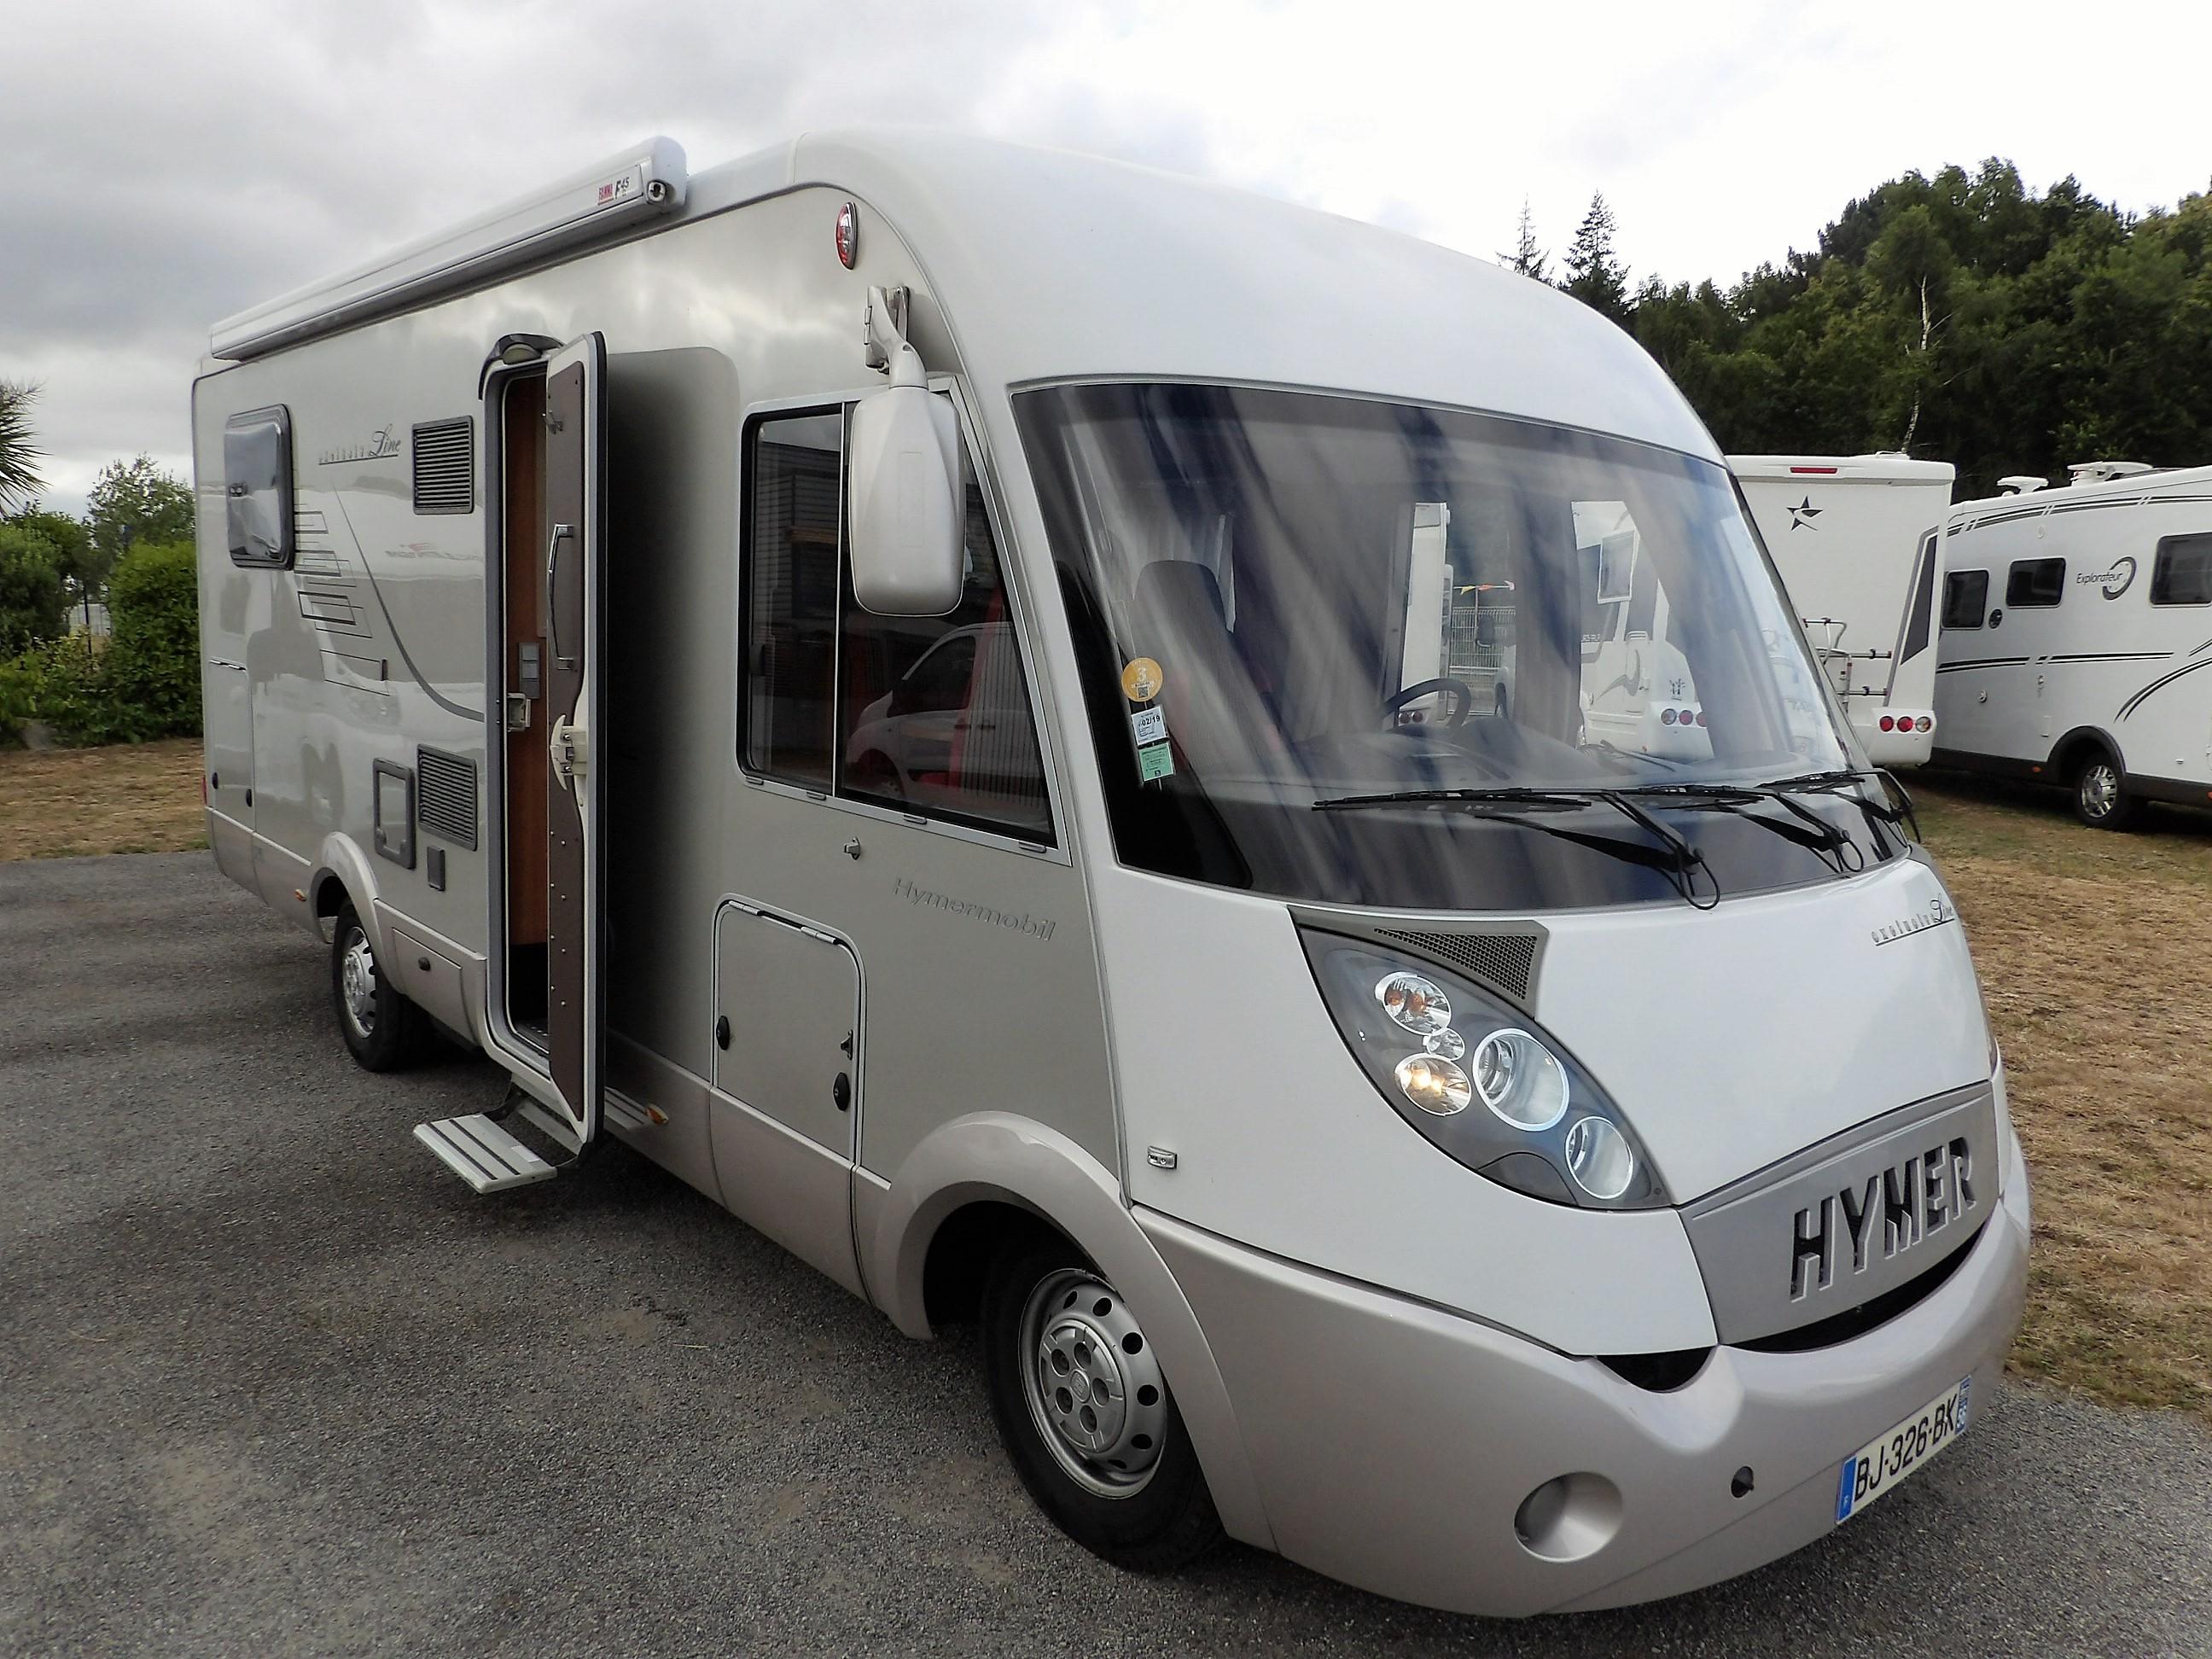 hymer 698 cl occasion de 2011 fiat camping car en vente locoal mendon sortie 36 morbihan 56. Black Bedroom Furniture Sets. Home Design Ideas